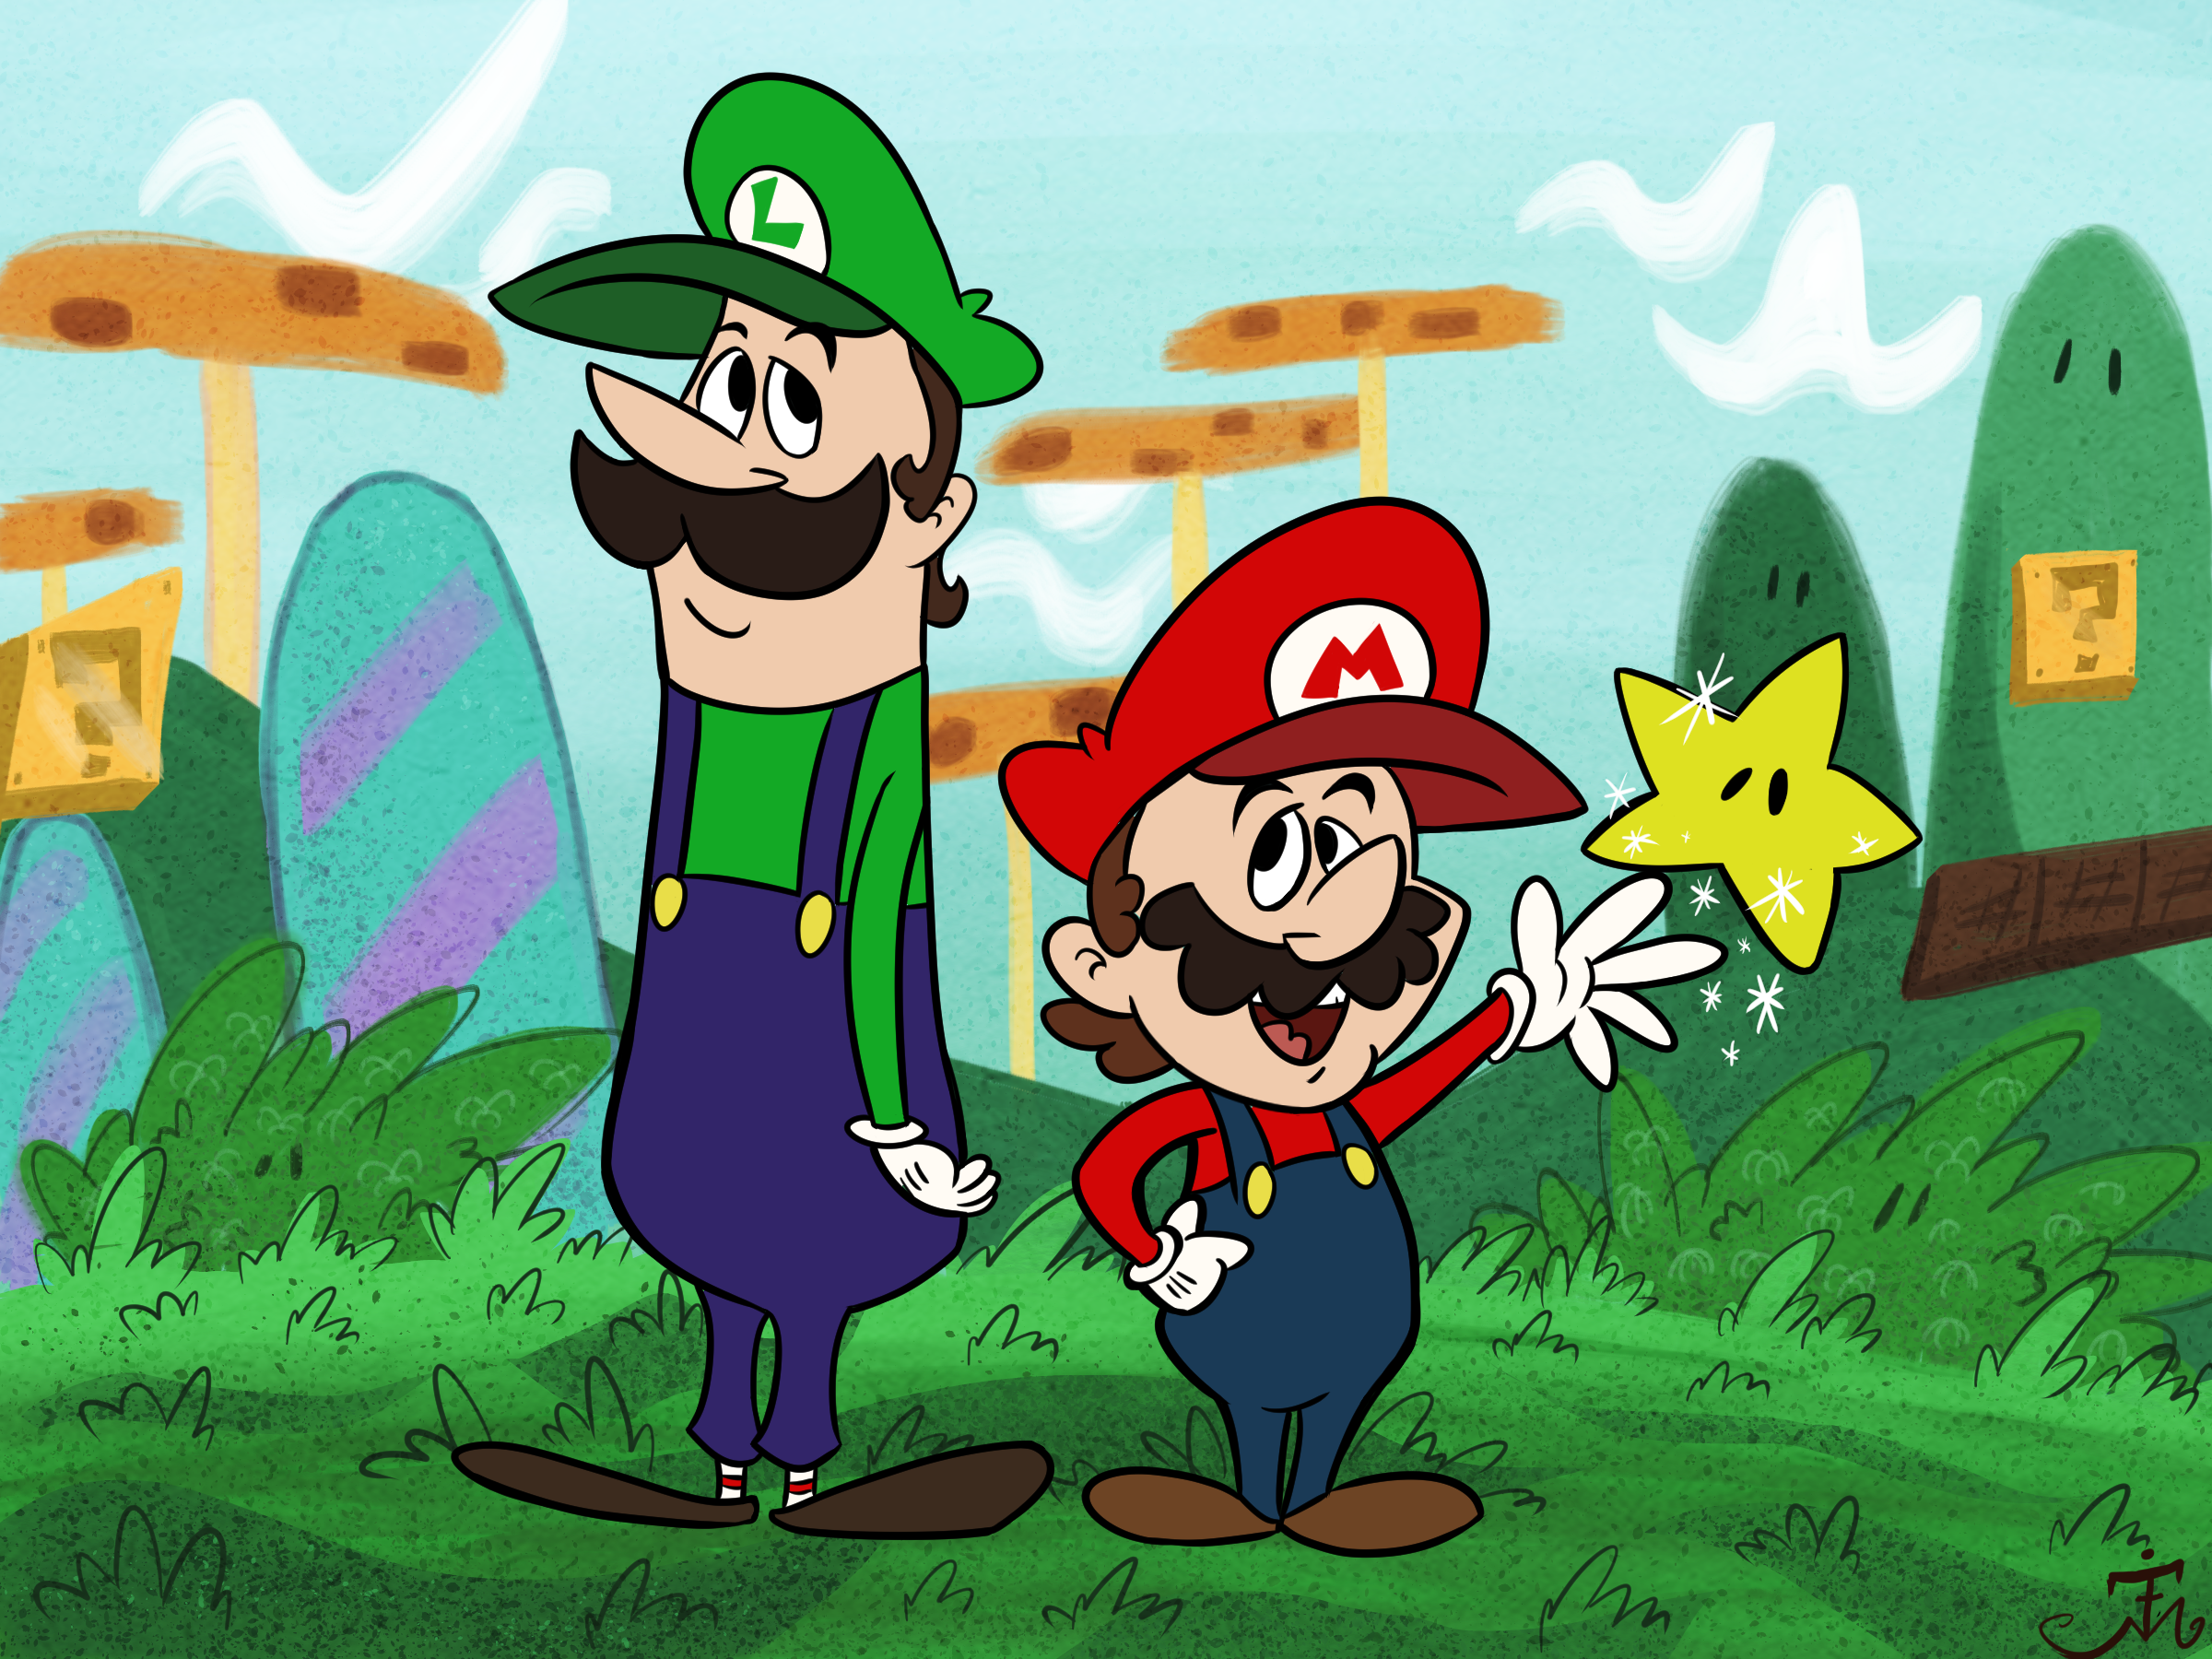 Hanna-Barbera Style Super Mario Bros.